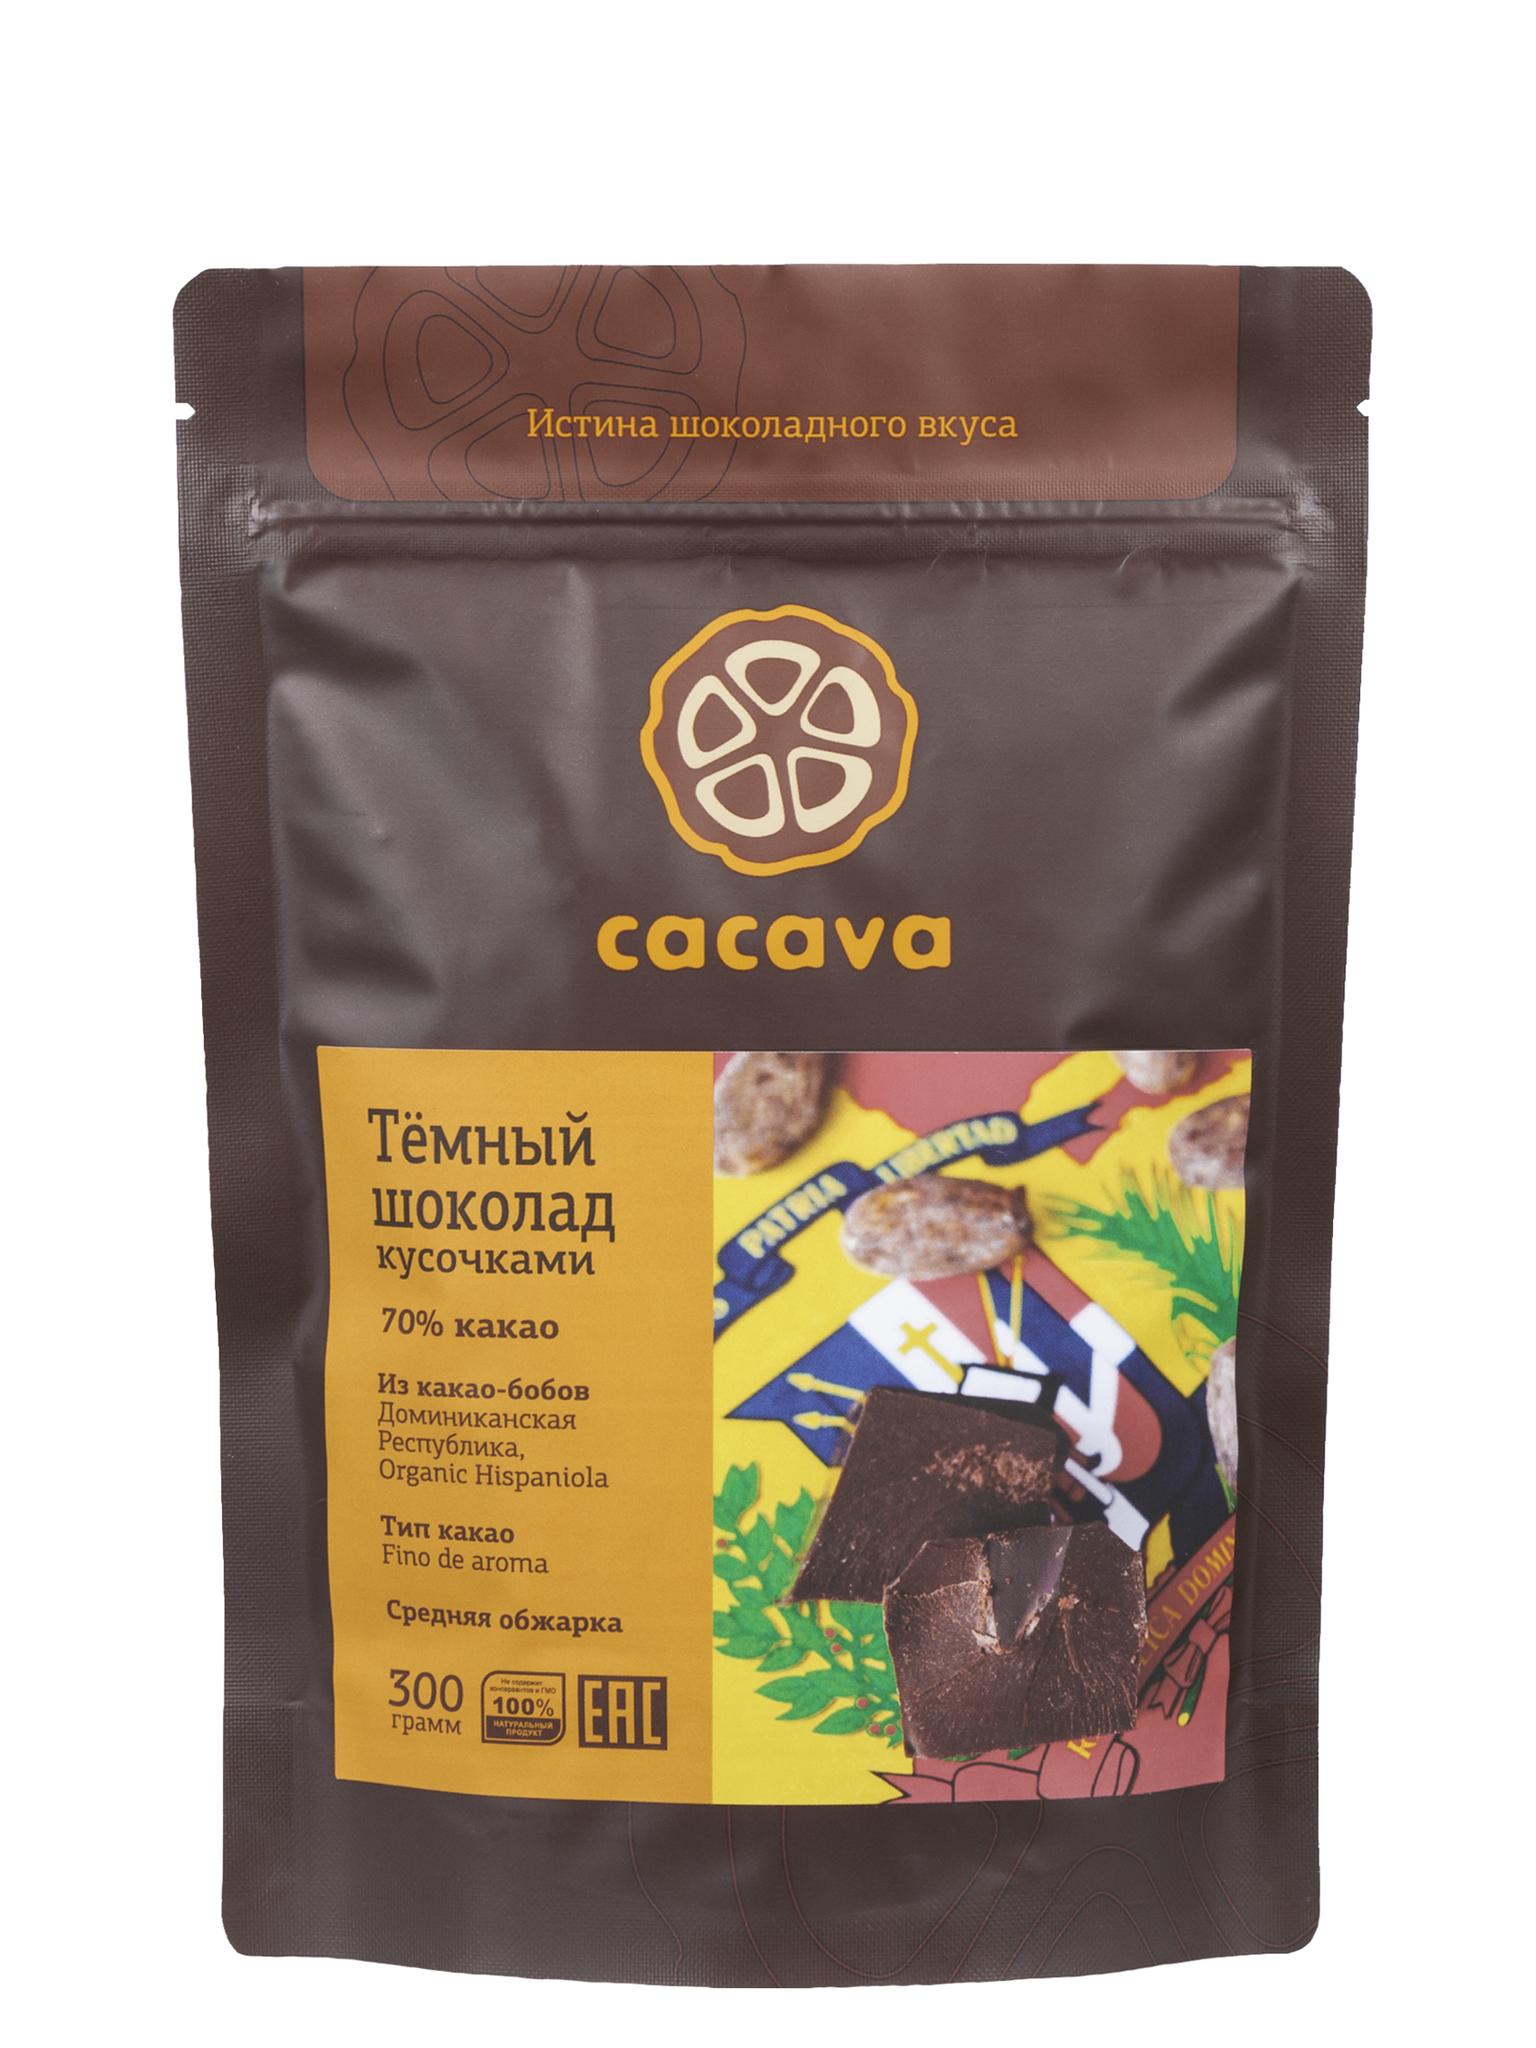 Тёмный шоколад 70 % какао (Доминикана), упаковка 300 грамм